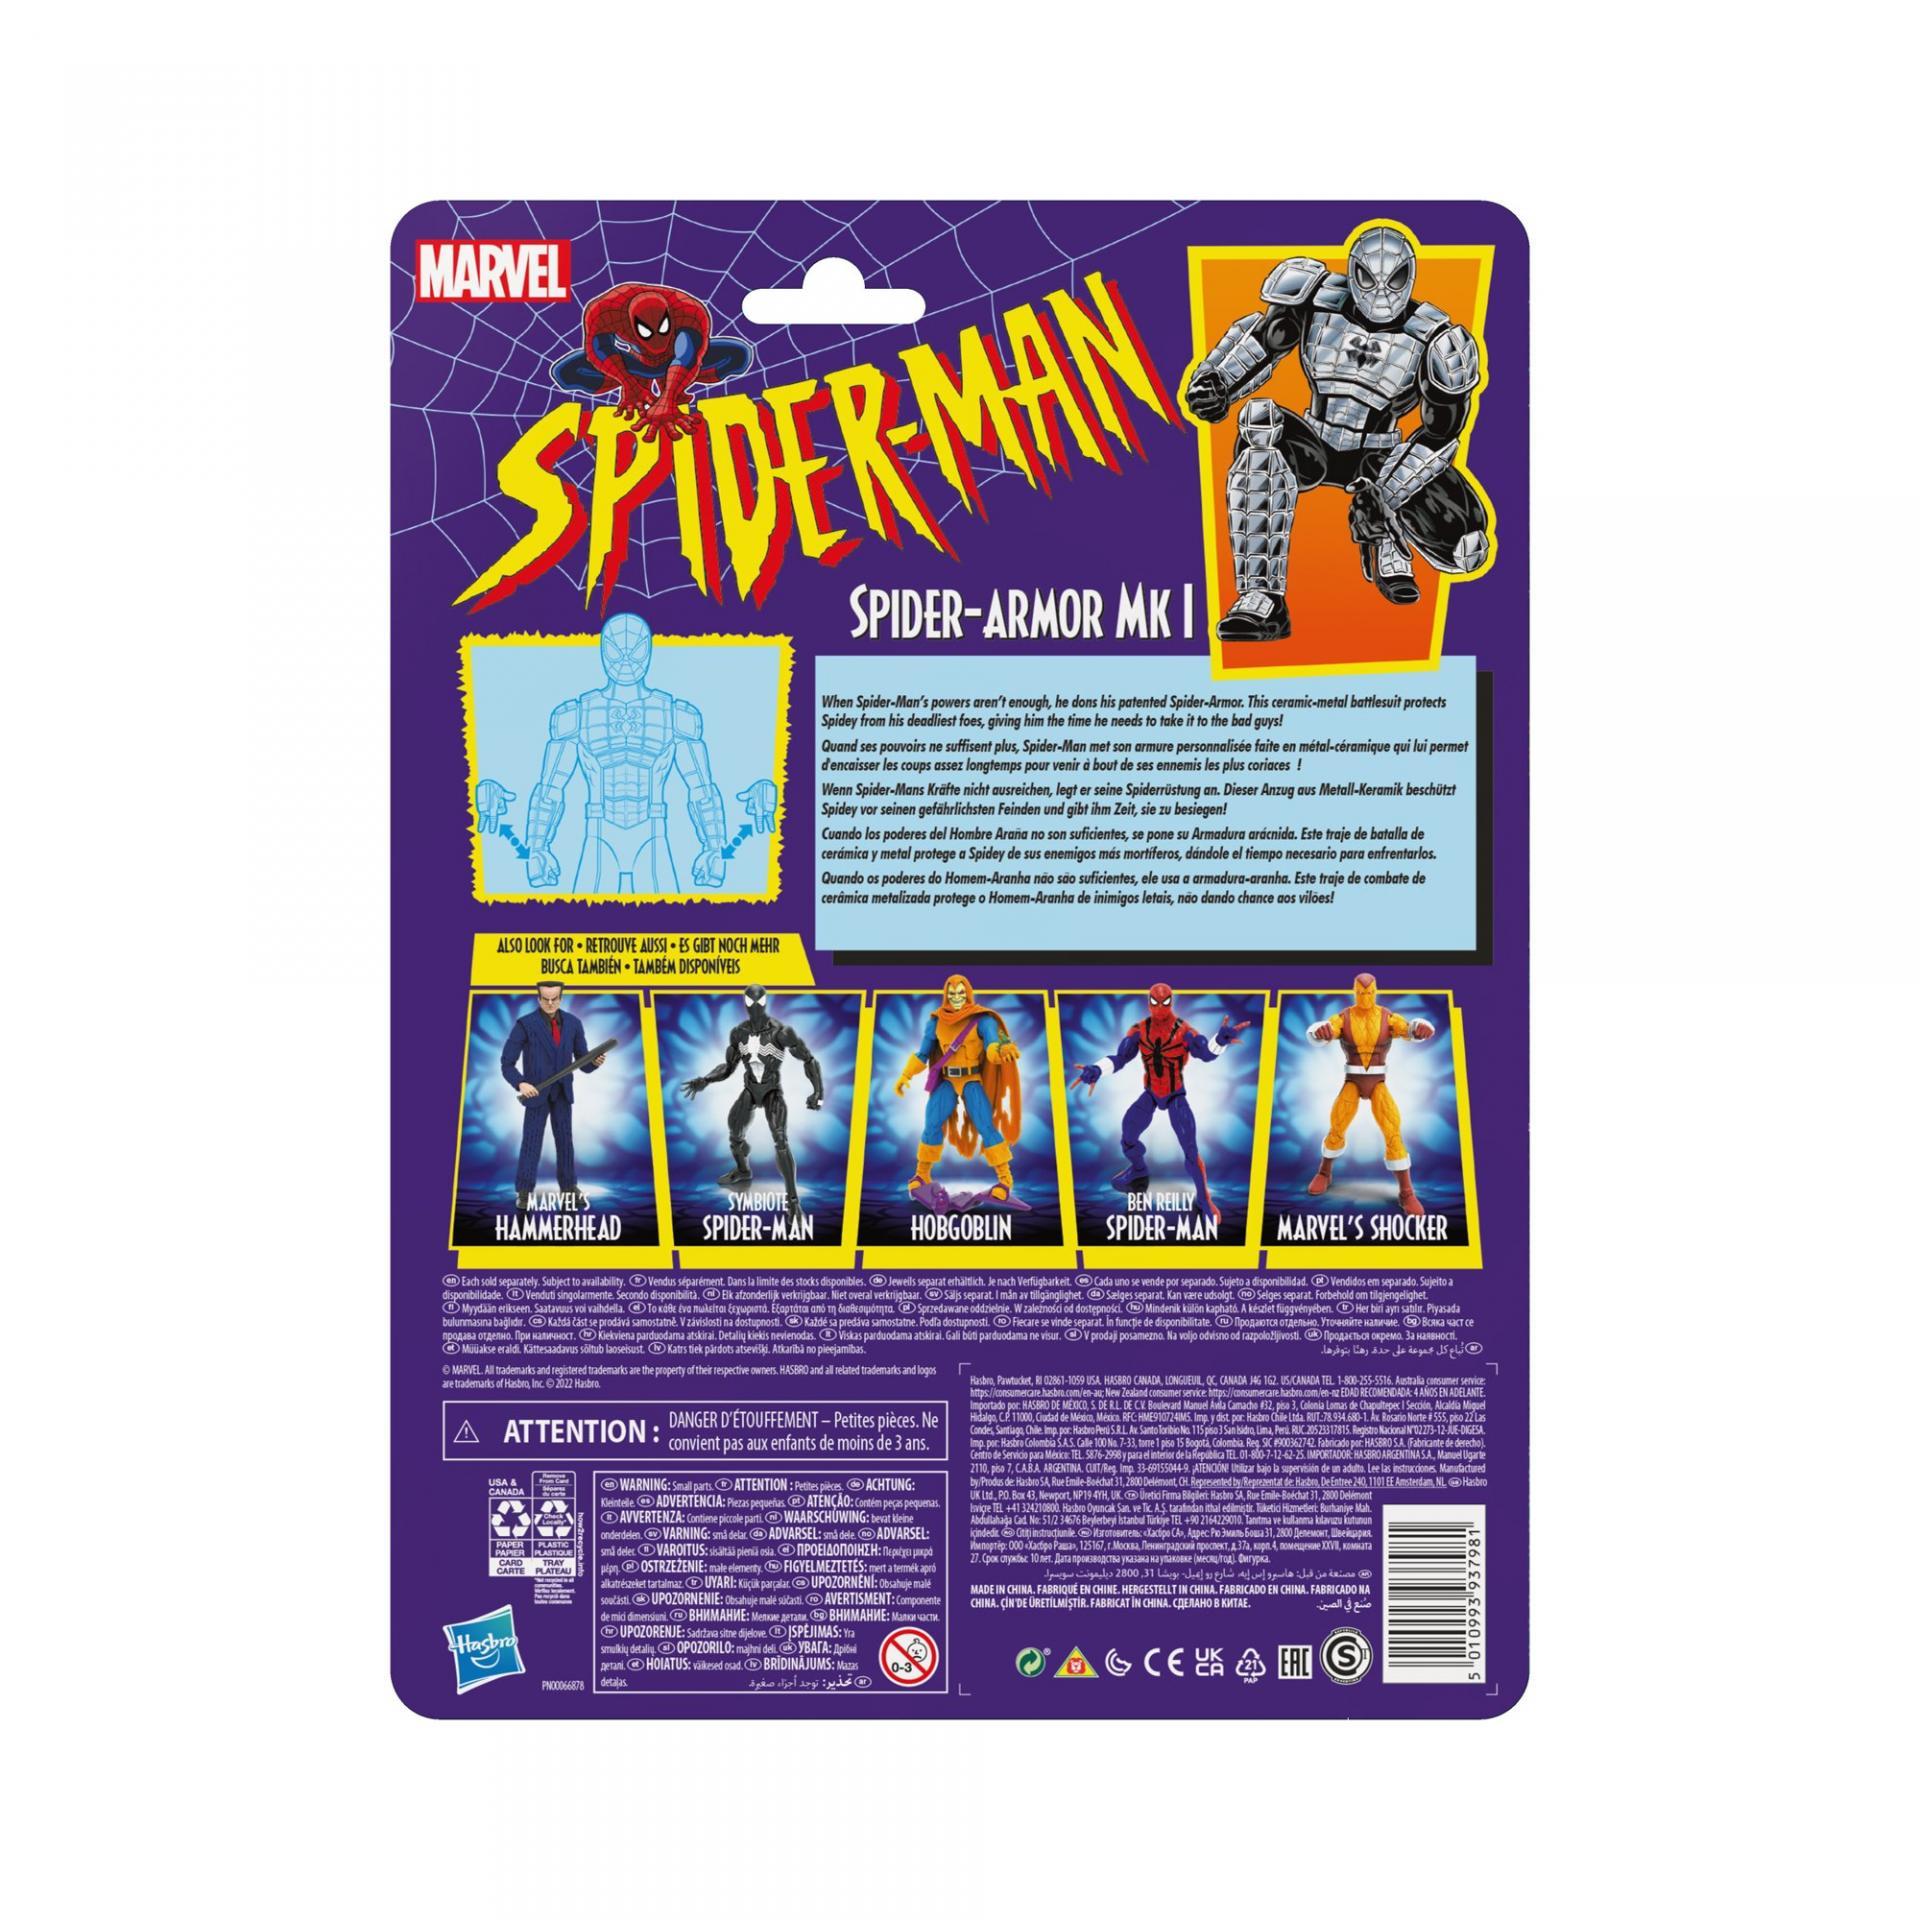 Marvel legends series hasbro spider armor mk i12